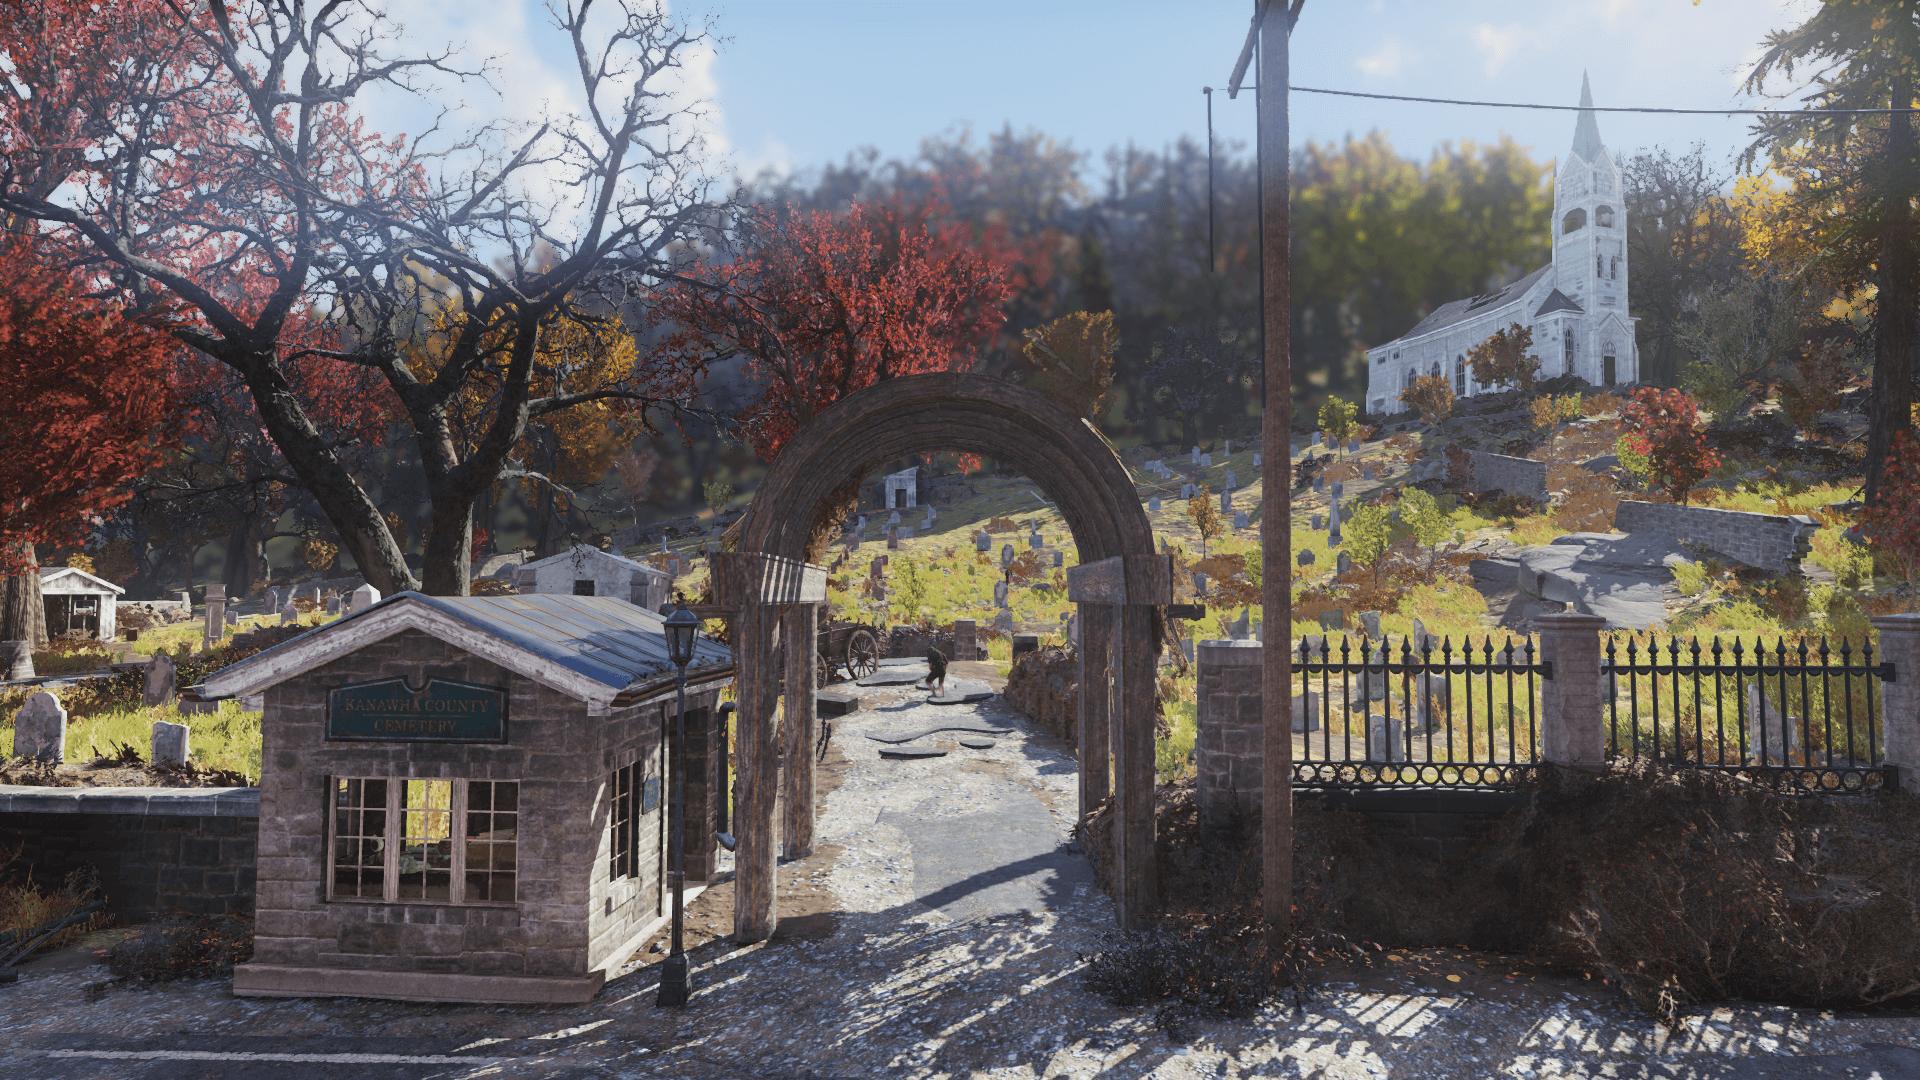 Kanawha County Cemetery